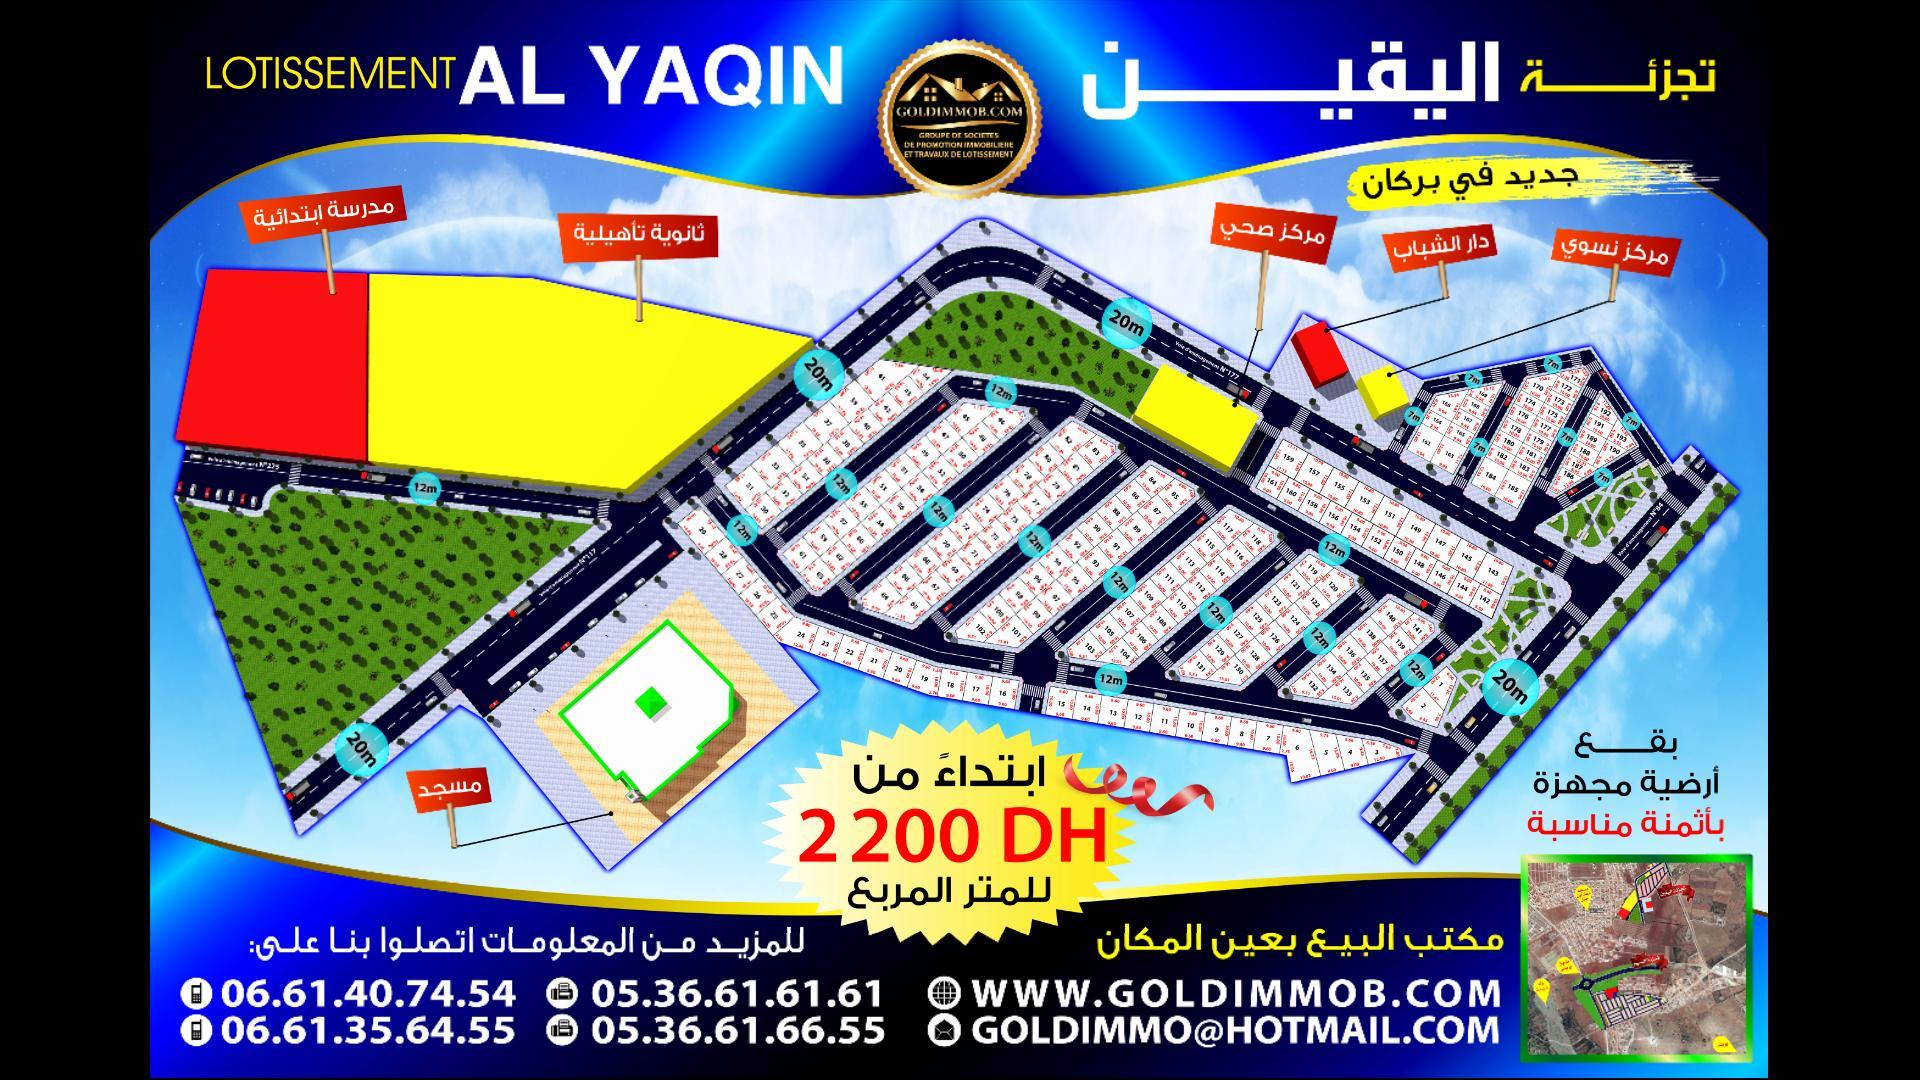 LOTISSEMENT AL YAQIN A PARTIR DE 2200DH M²